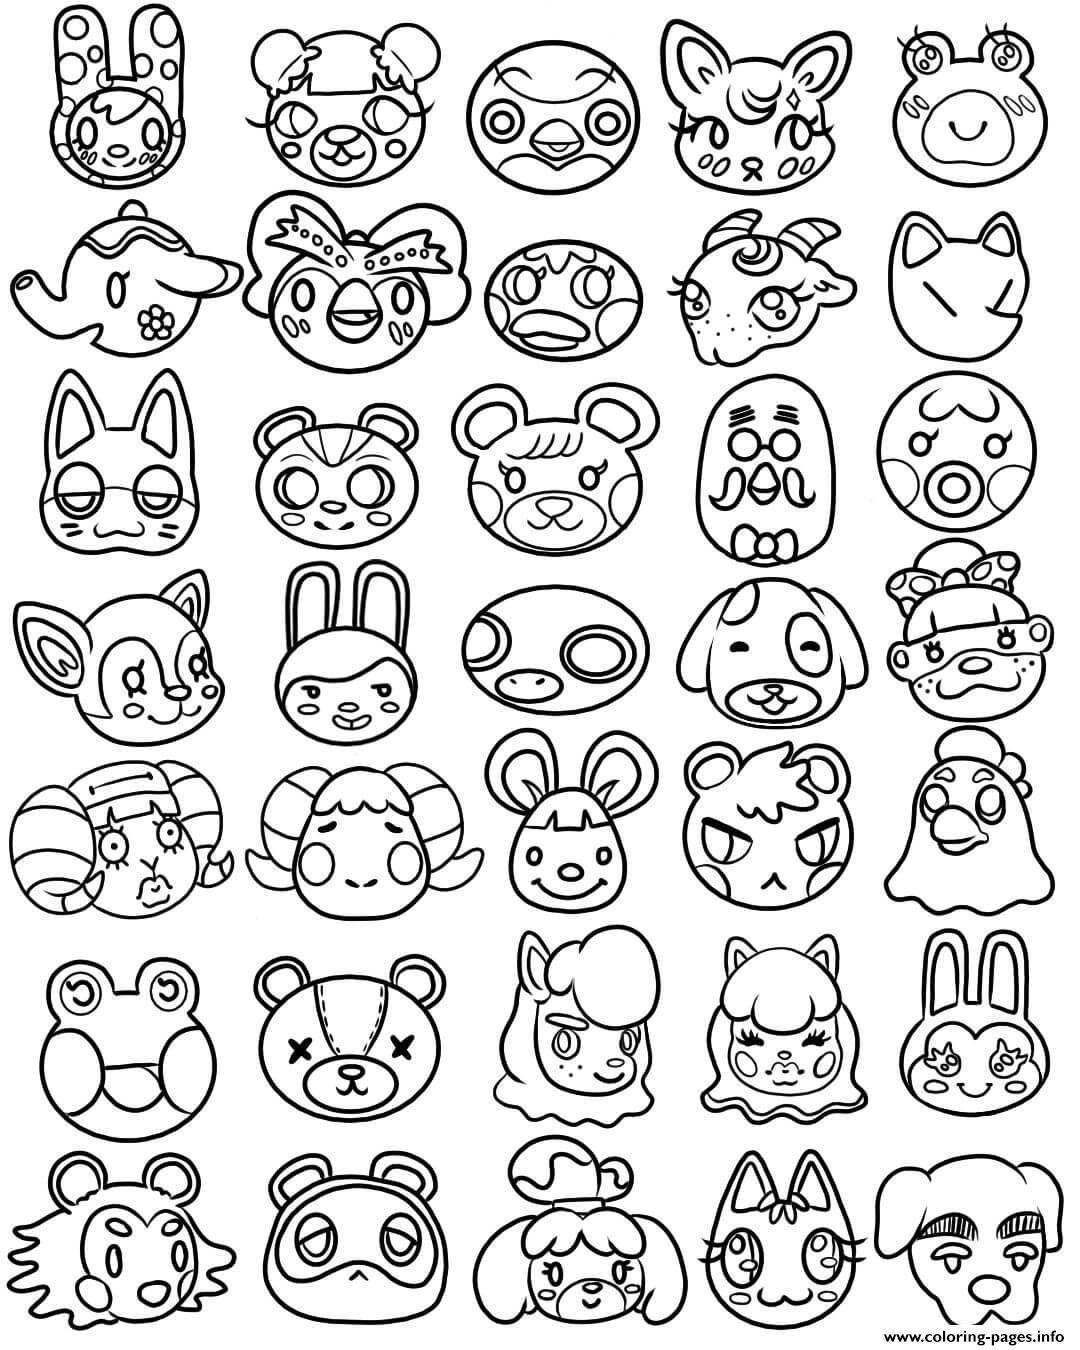 Print animal crossing kawaii cute head coloring pages  Coloring